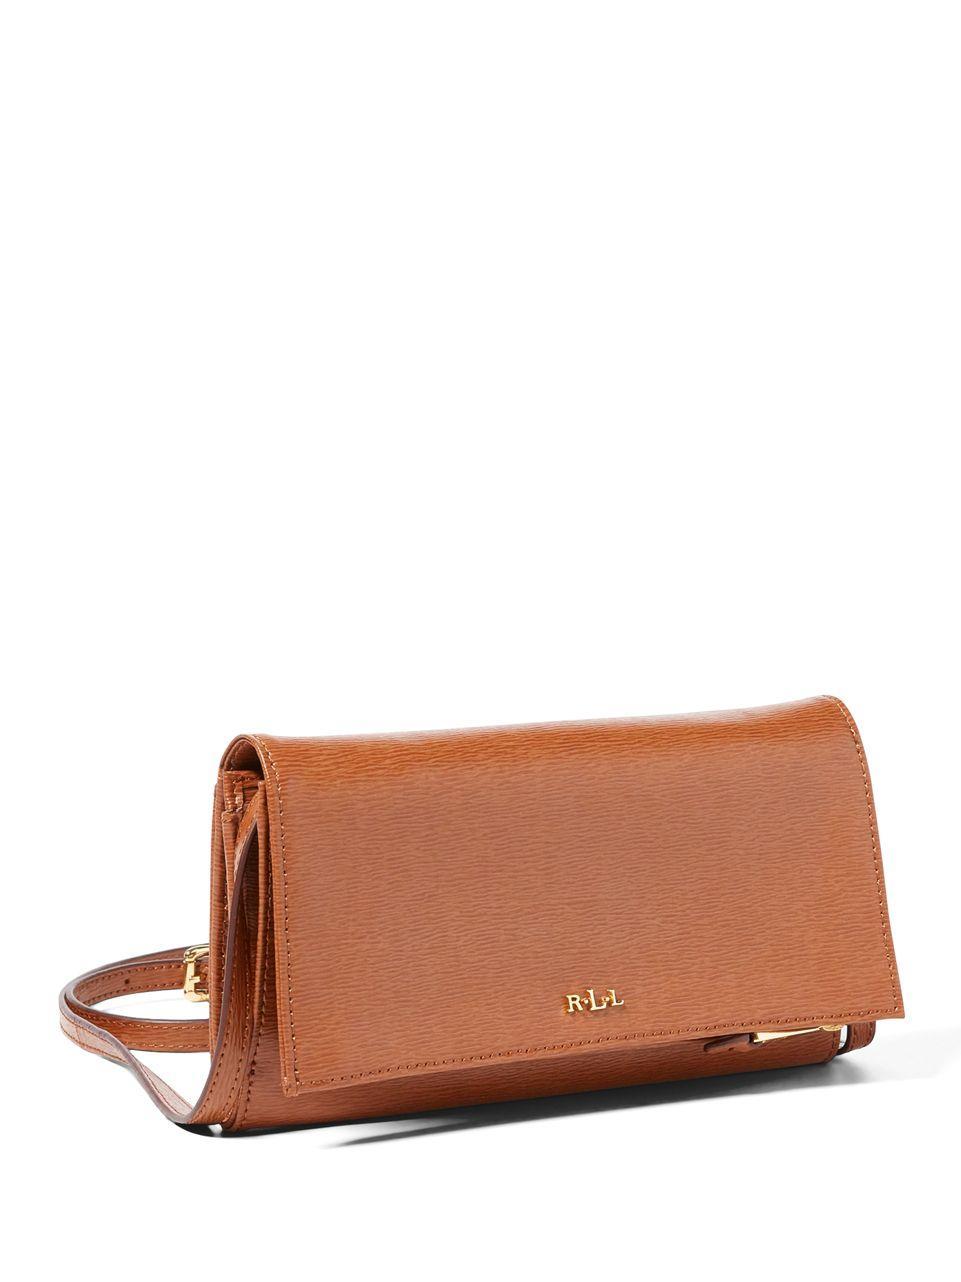 424b85f6250c Lyst - Lauren by Ralph Lauren Newbury Mini Saffiano Leather ...